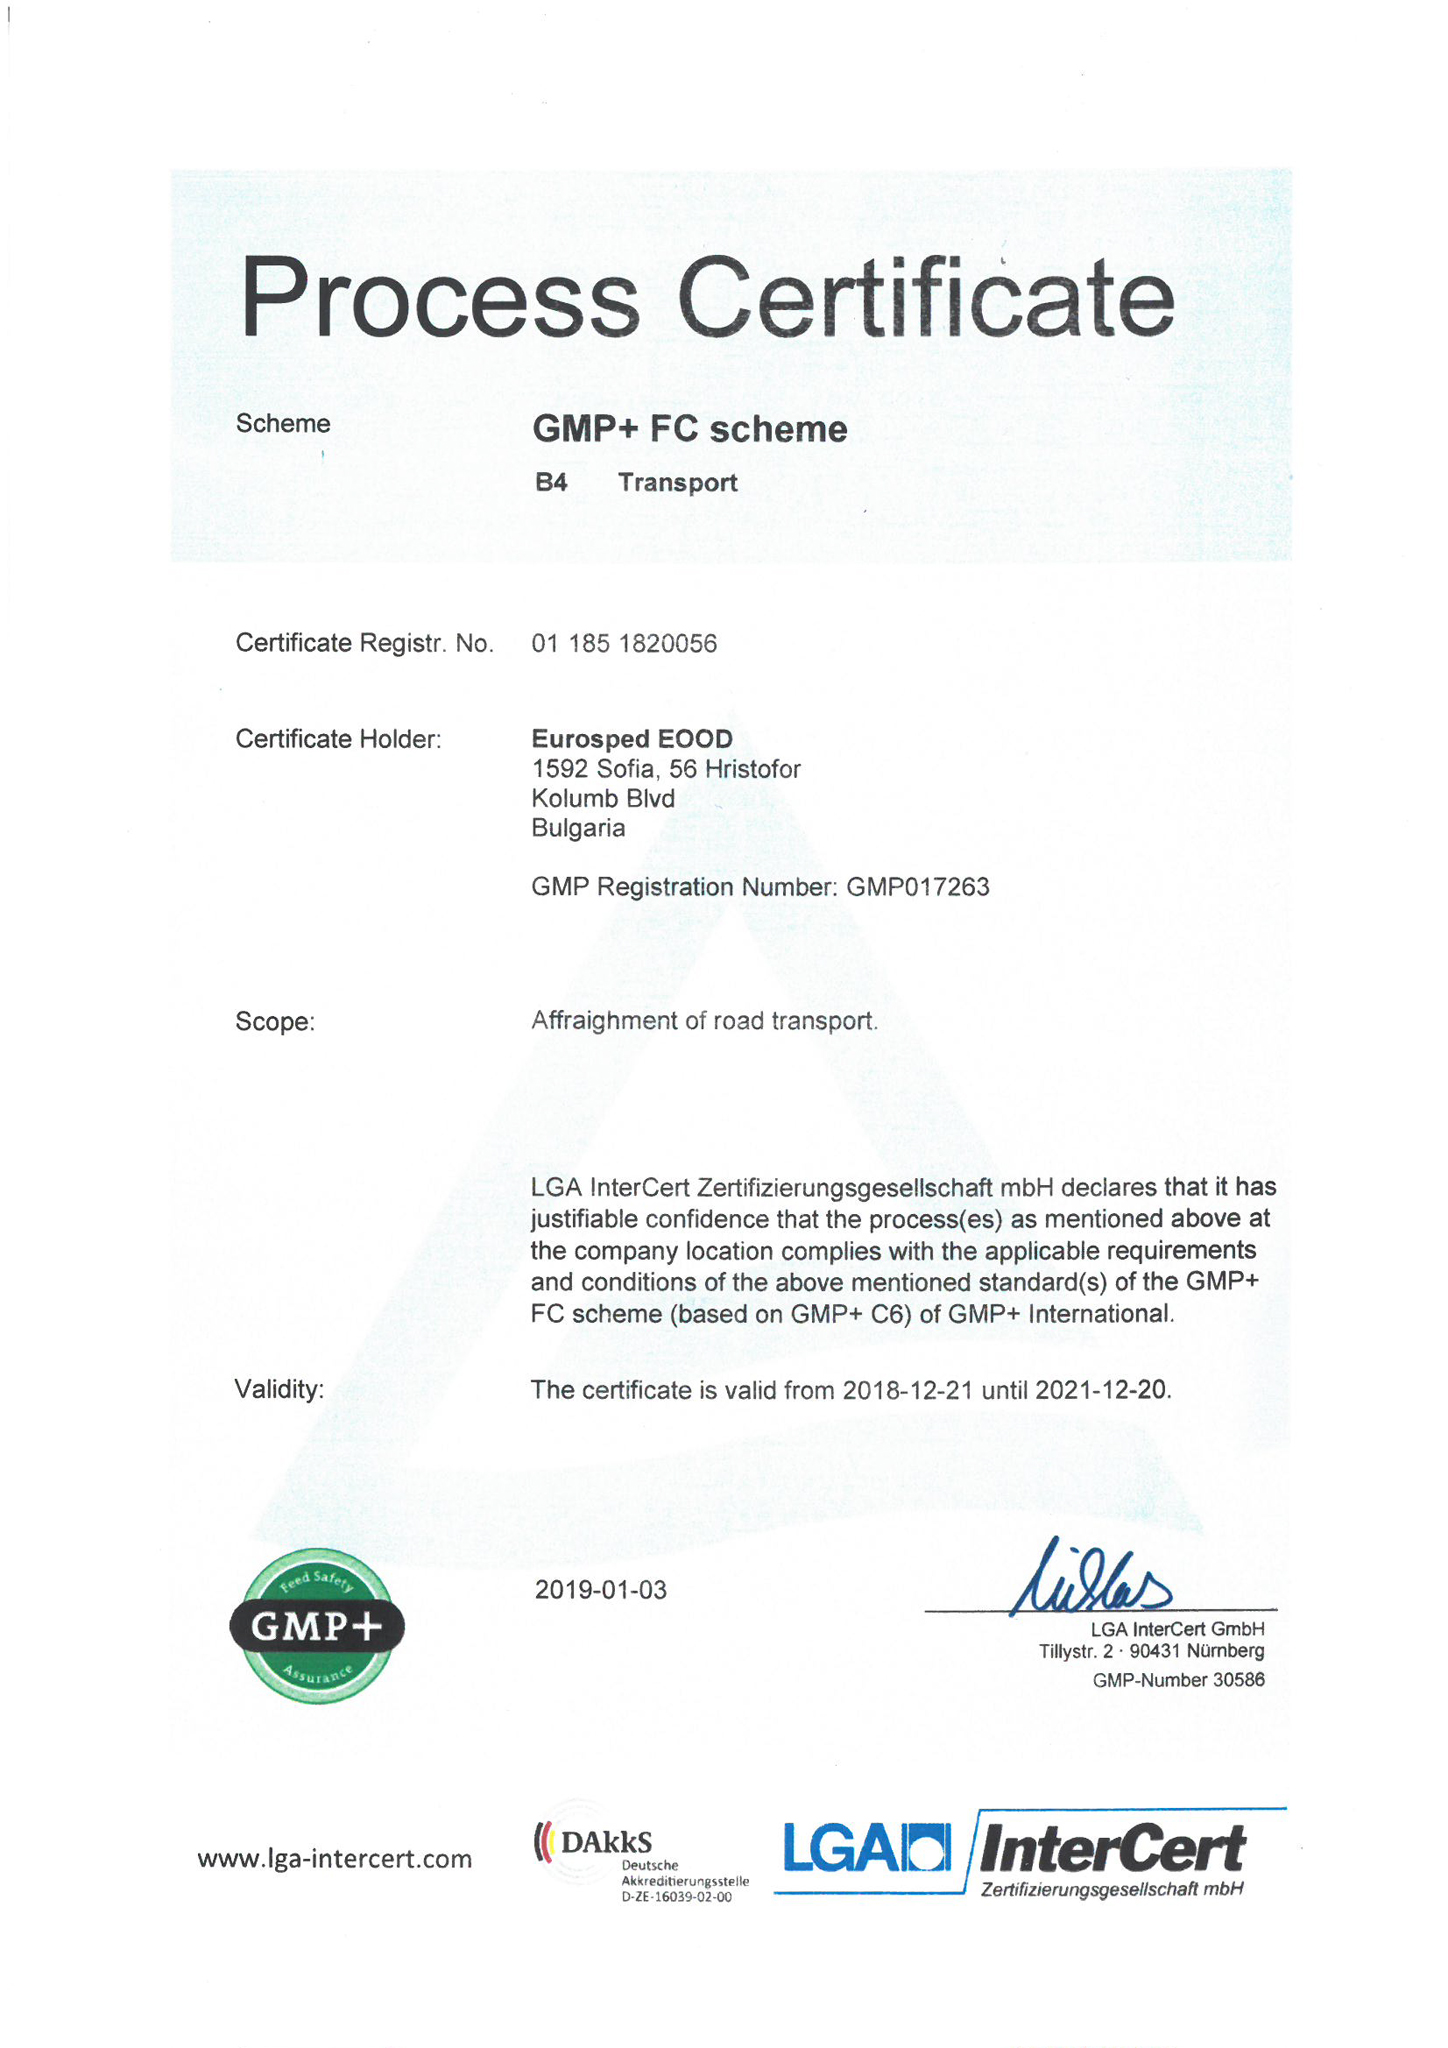 certificate-gmpb4-eurospedeood